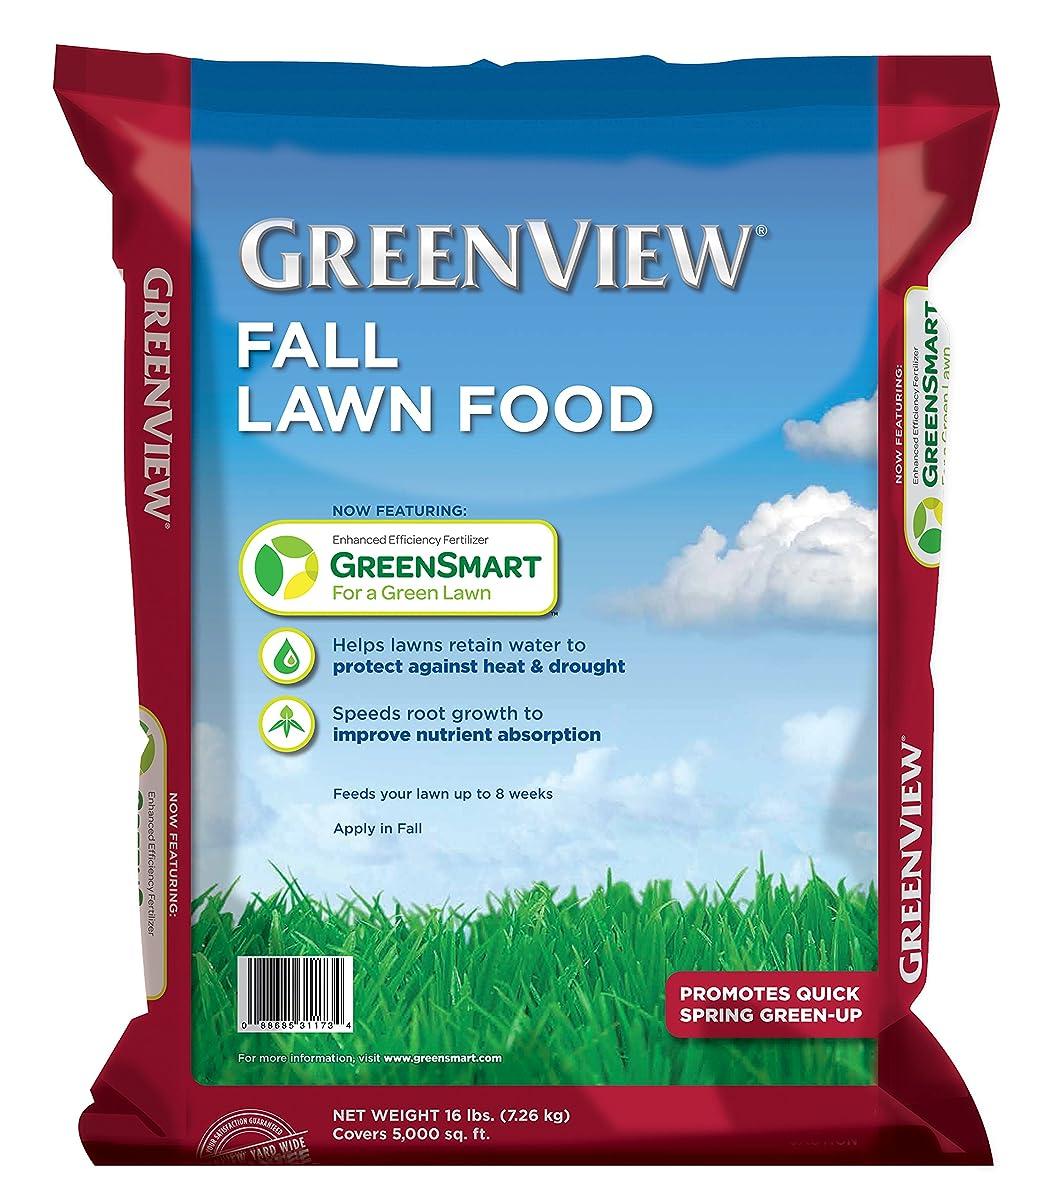 GreenView Fall Lawn Food - 16 lb. bag, Covers 5,000 sq. ft